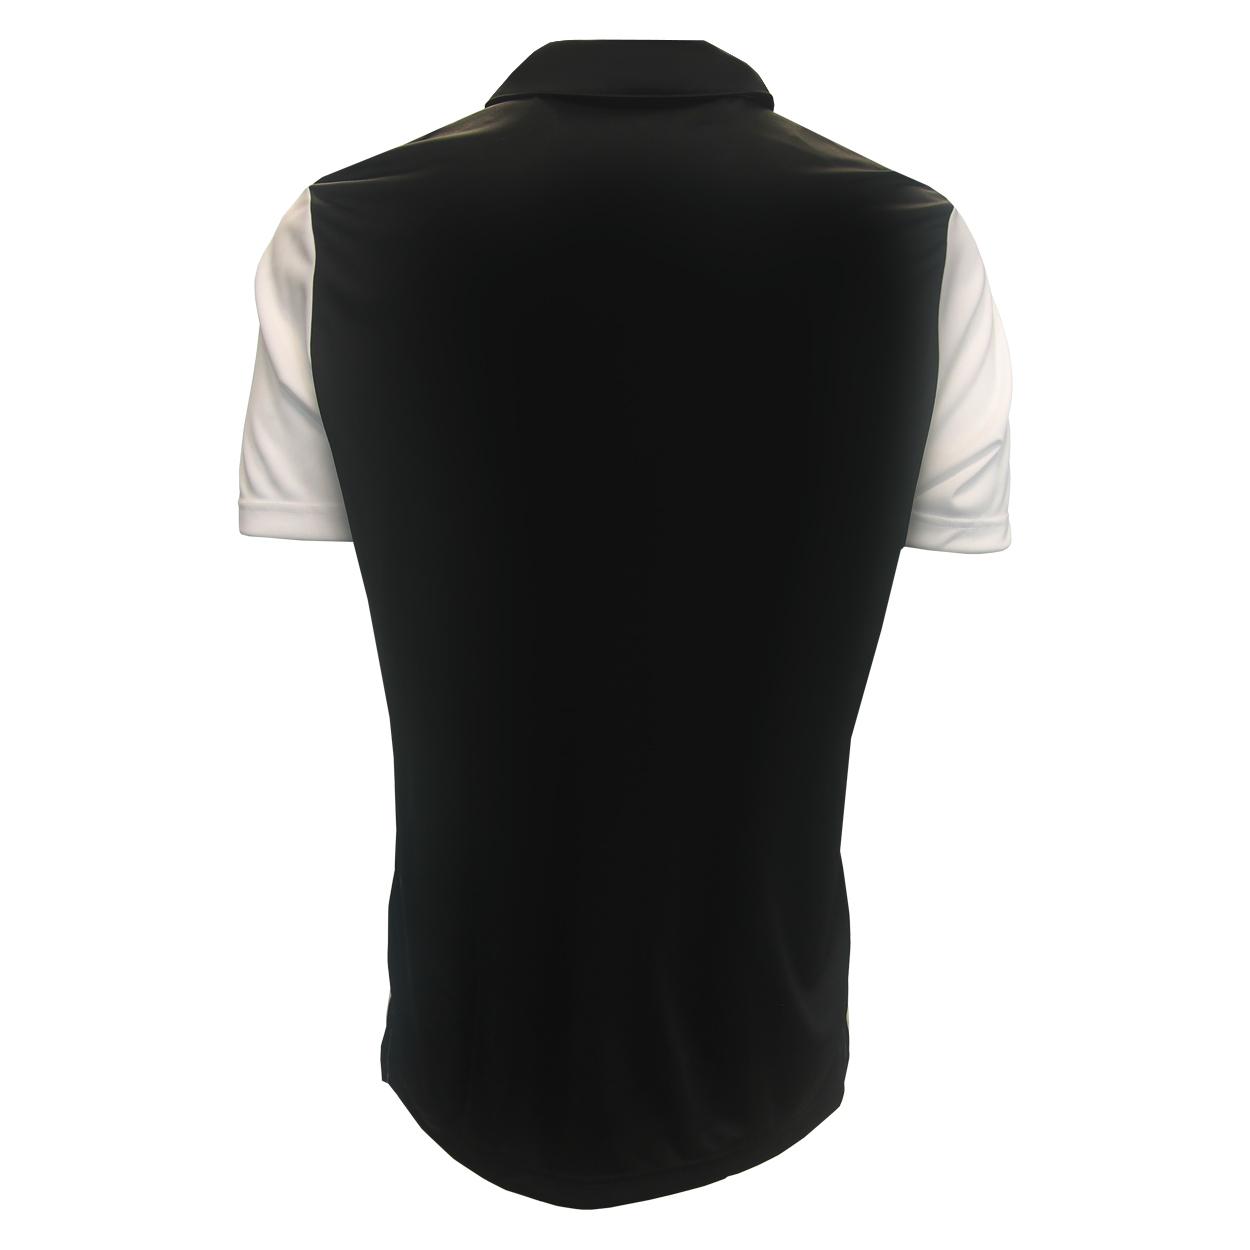 Adidas-Golf-Men-039-s-Black-Stripe-Polo-Shirt-NEW thumbnail 6